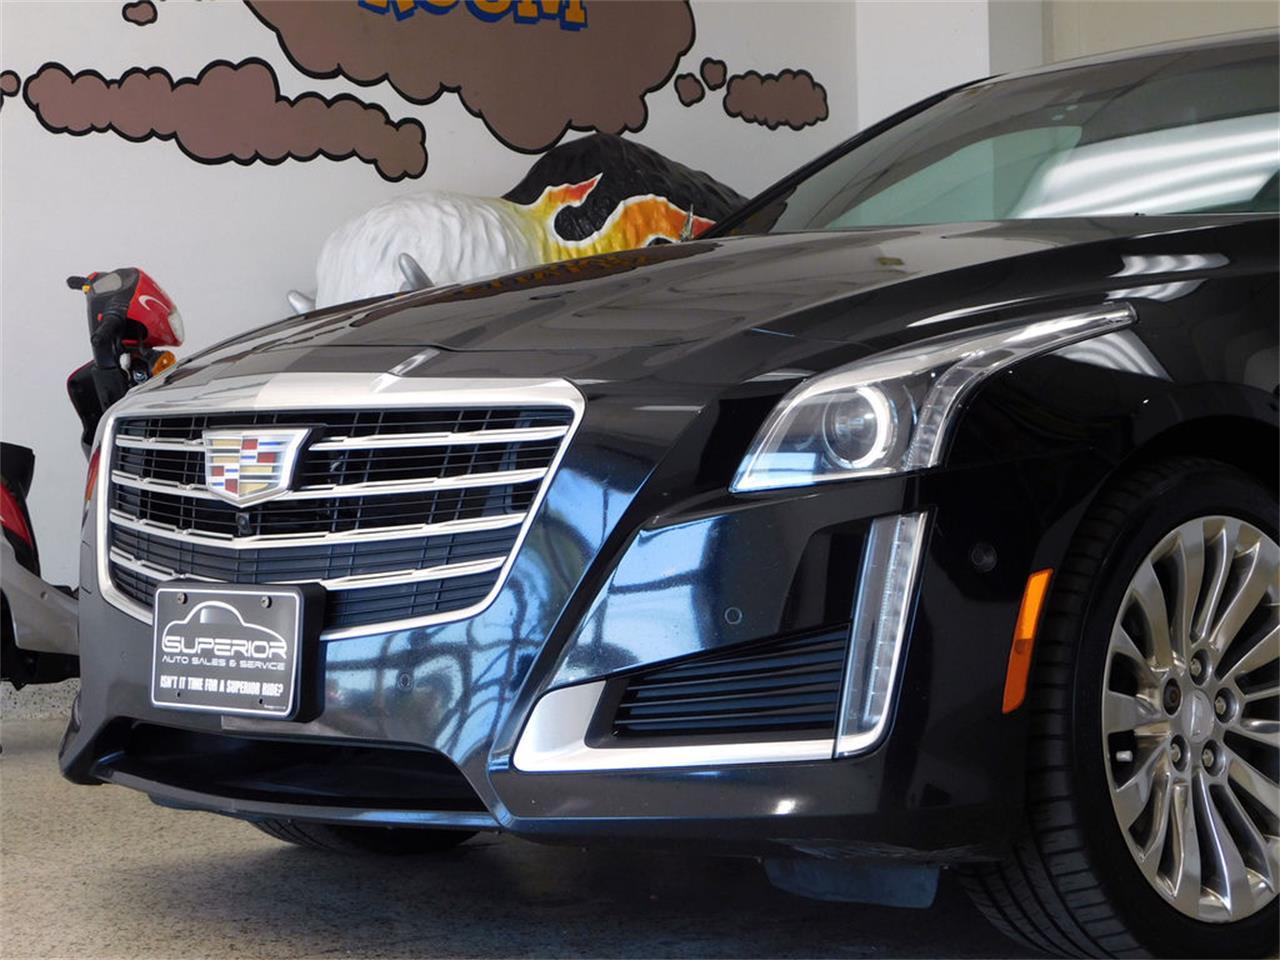 2018 Cadillac CTS (CC-1389388) for sale in Hamburg, New York